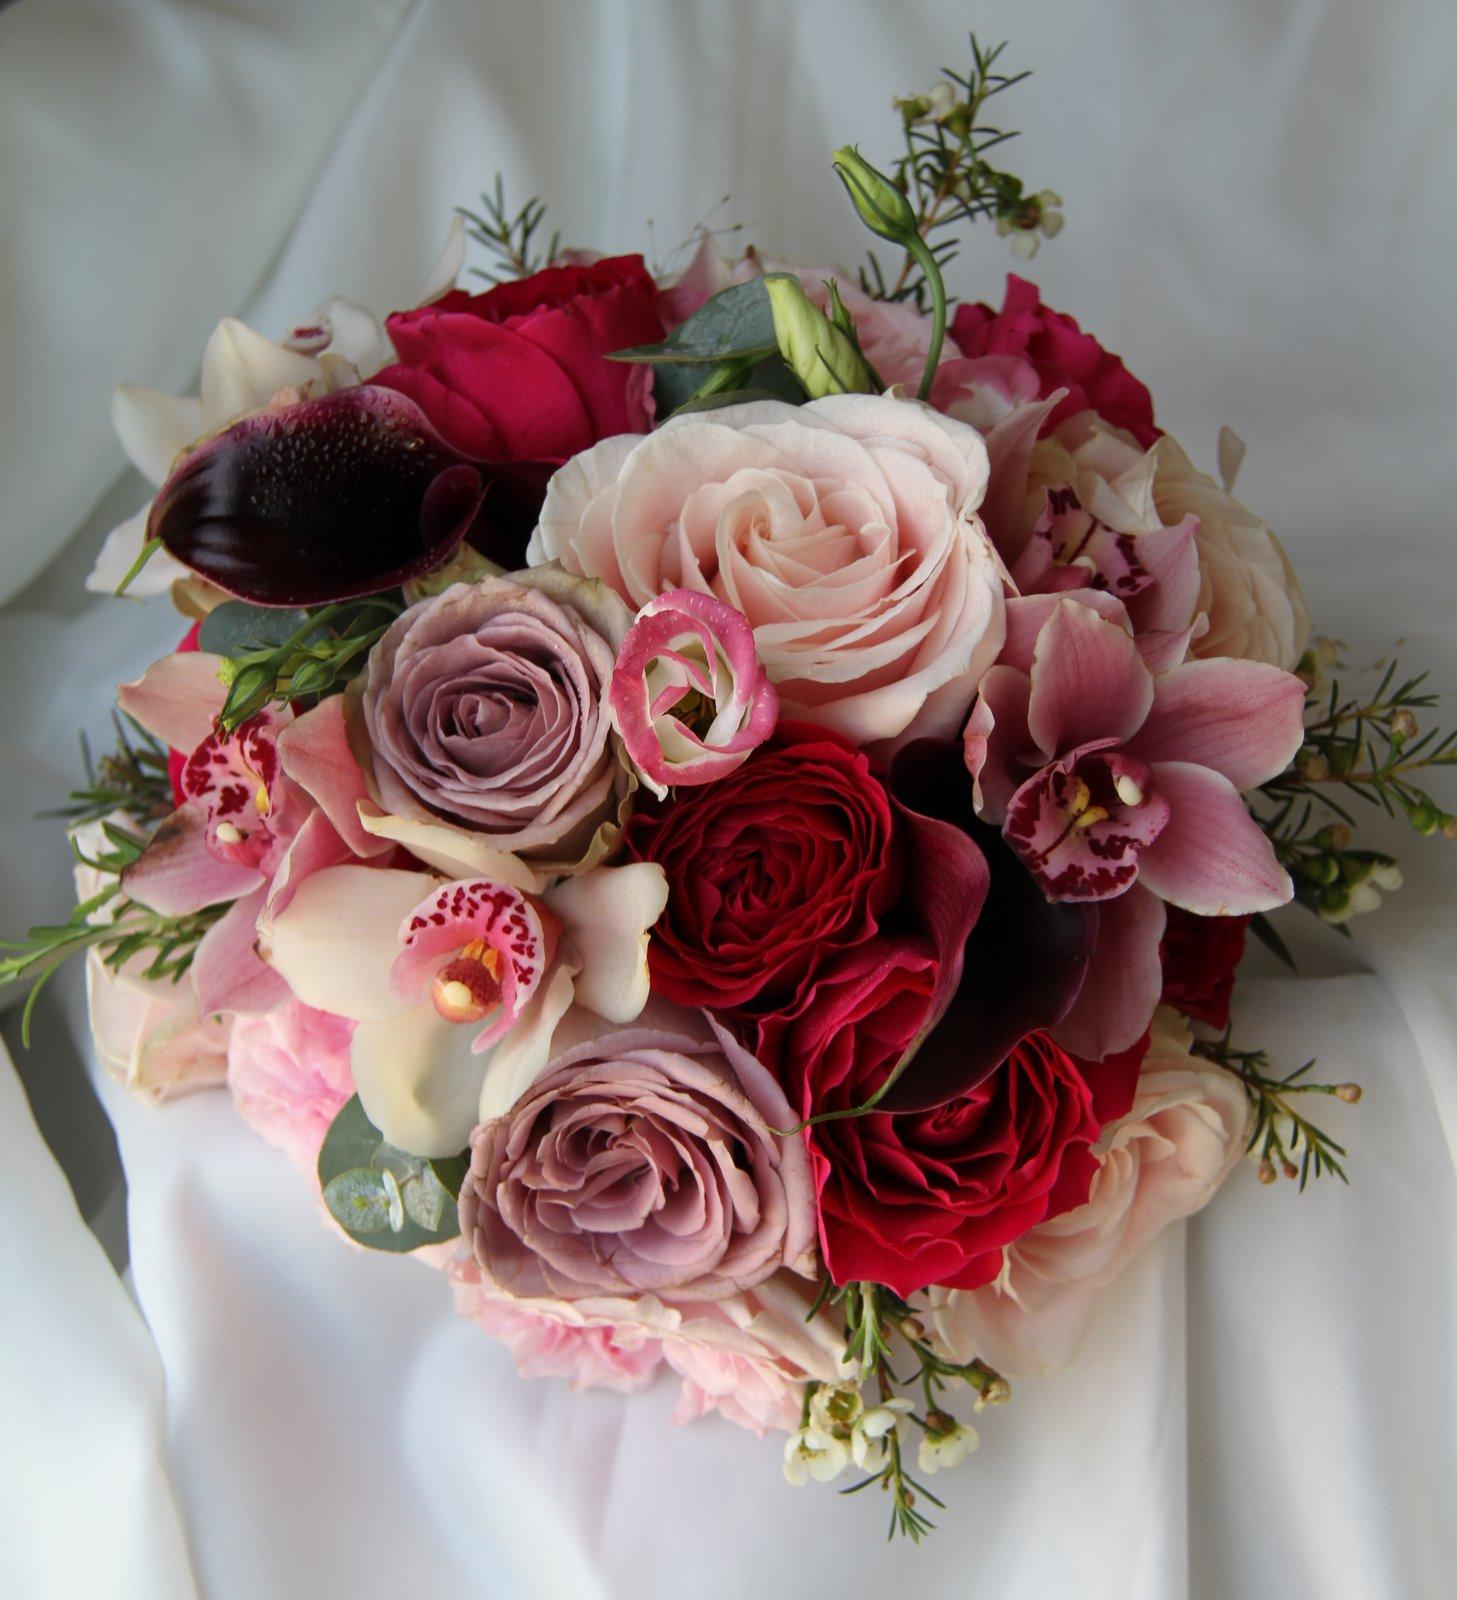 Darians blog: Free Shipping ballroom wedding dresses. ballroom dresses